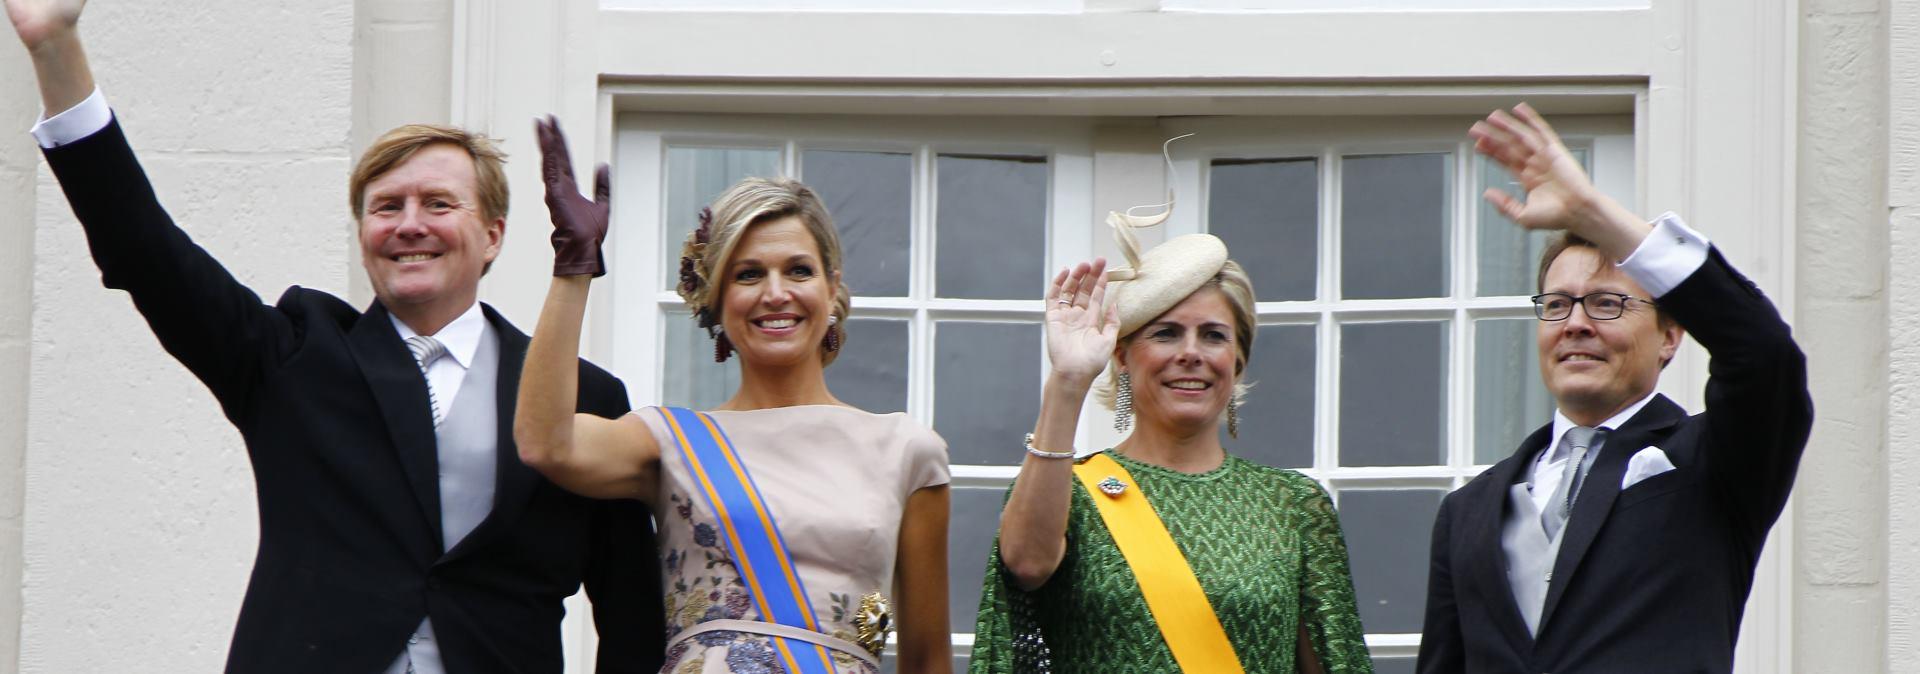 VIDEO: Nizozemski kralj Willem-Alexander i kraljica Maxima pozdravili naciju na Prinčev dan